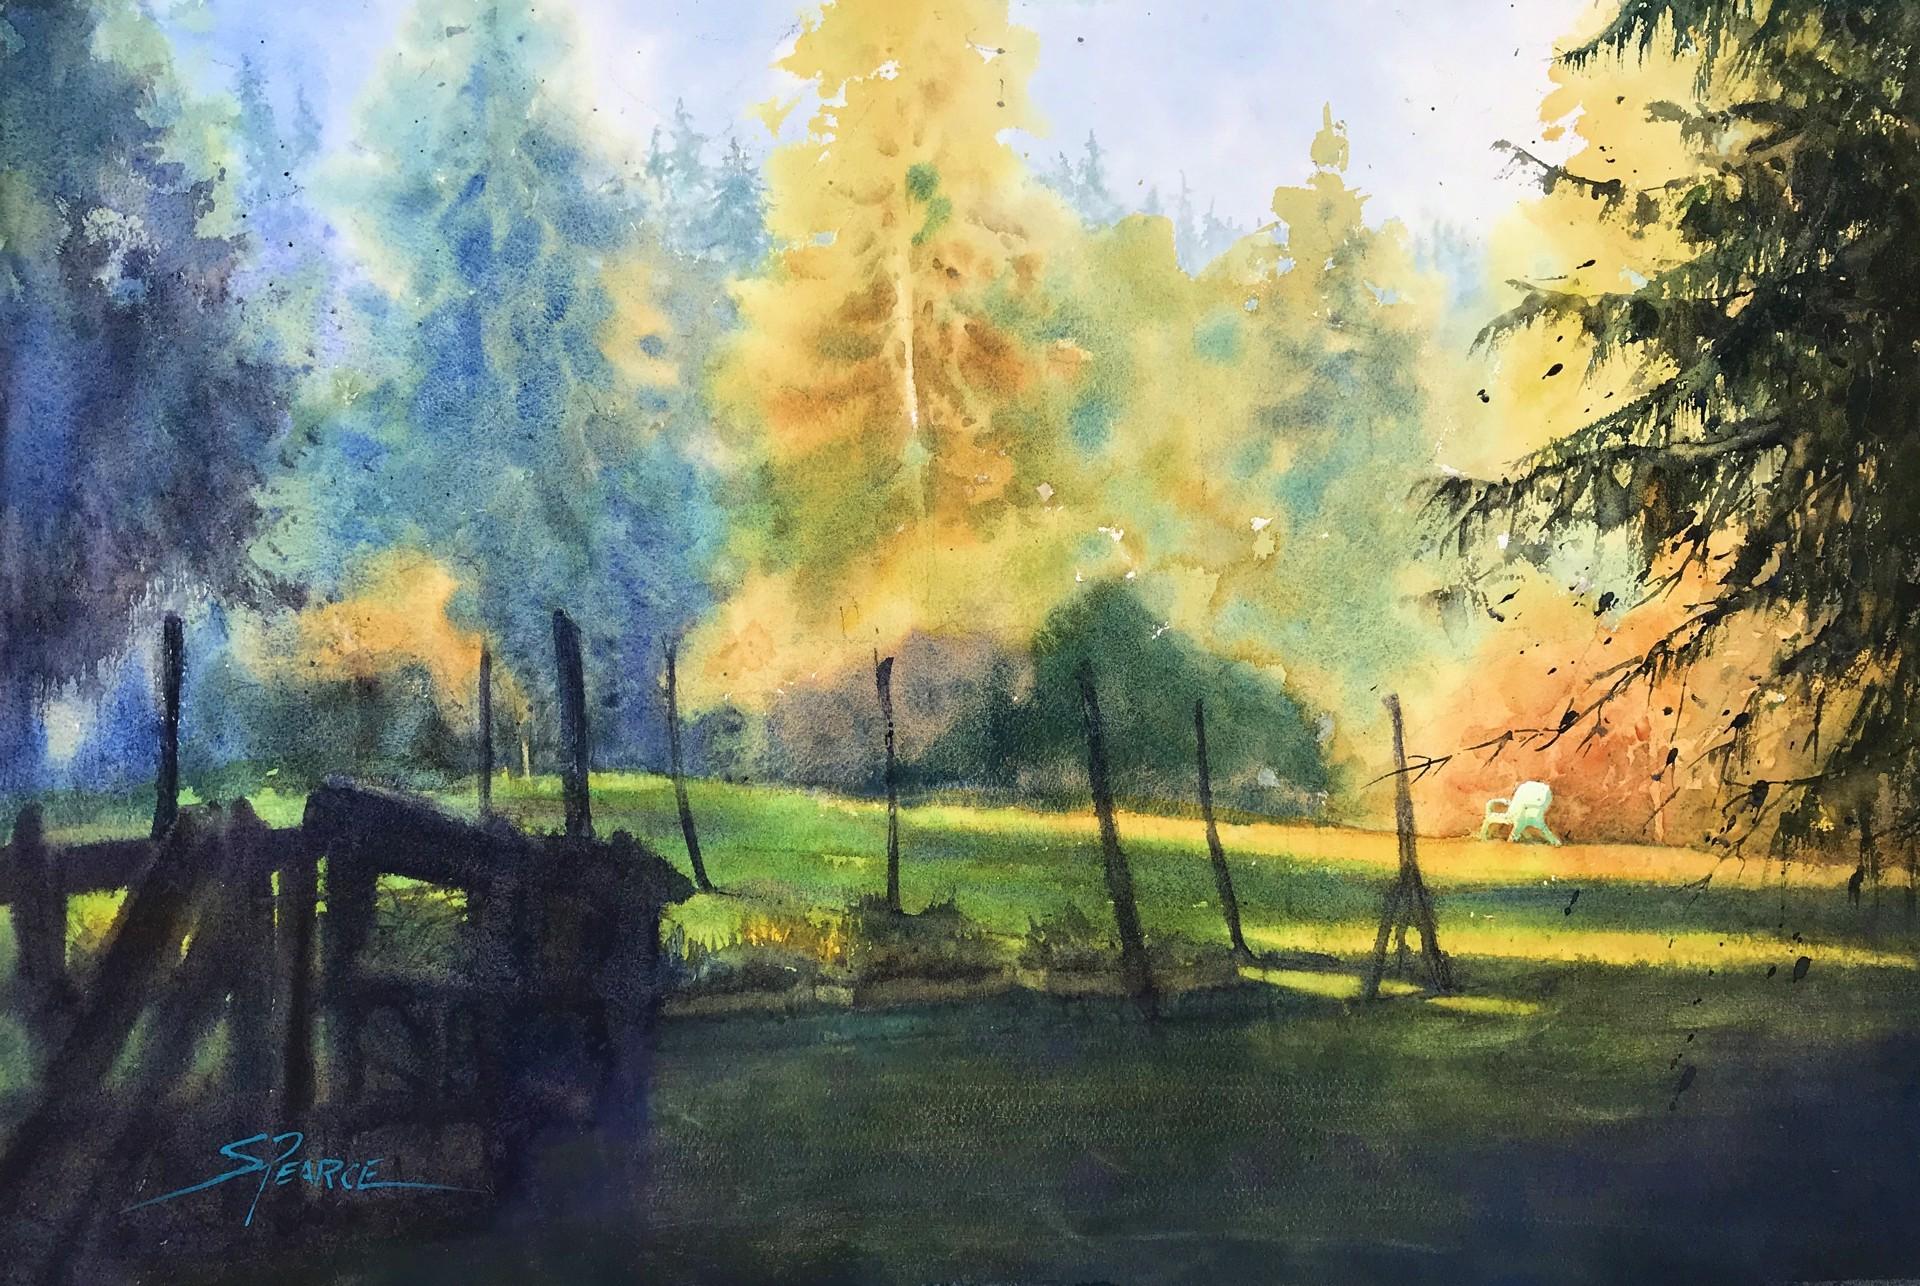 Sunrise in the Garden by Sandra Pearce